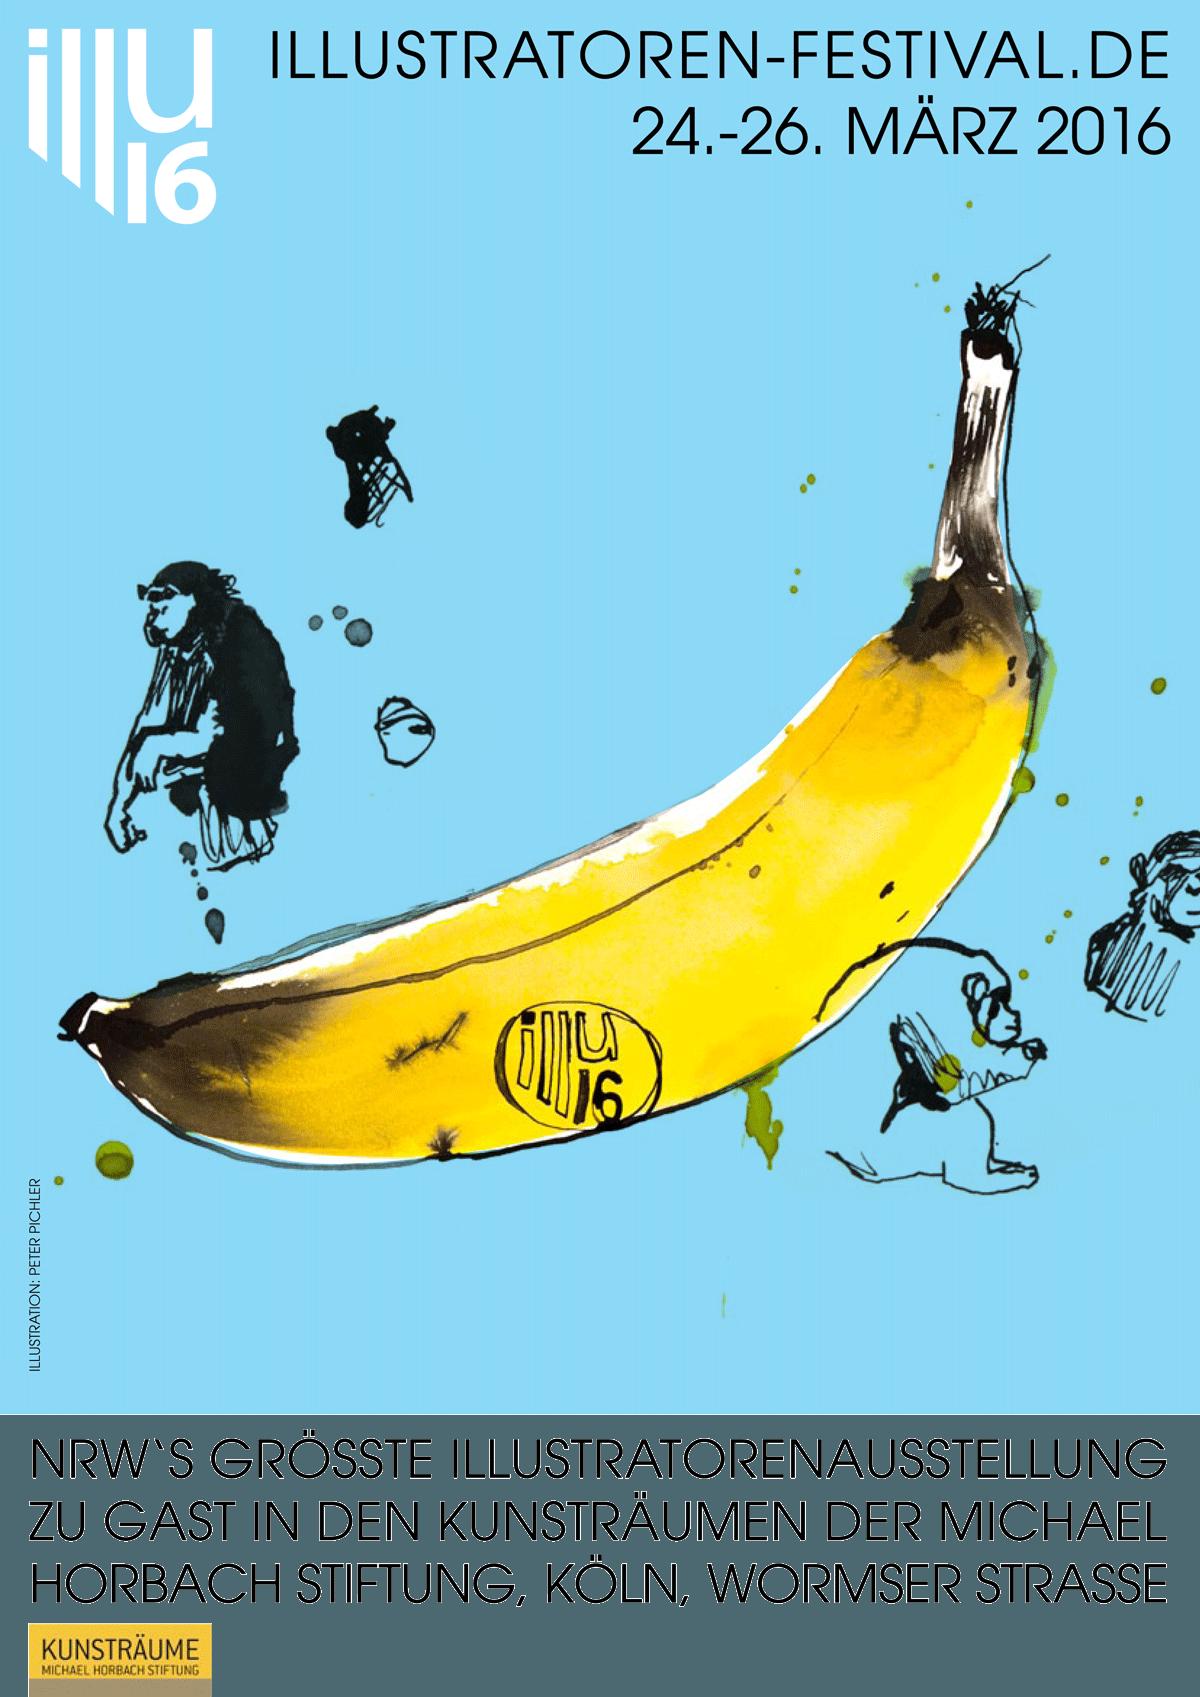 Illustration, Illustratioren Festival, Illu16